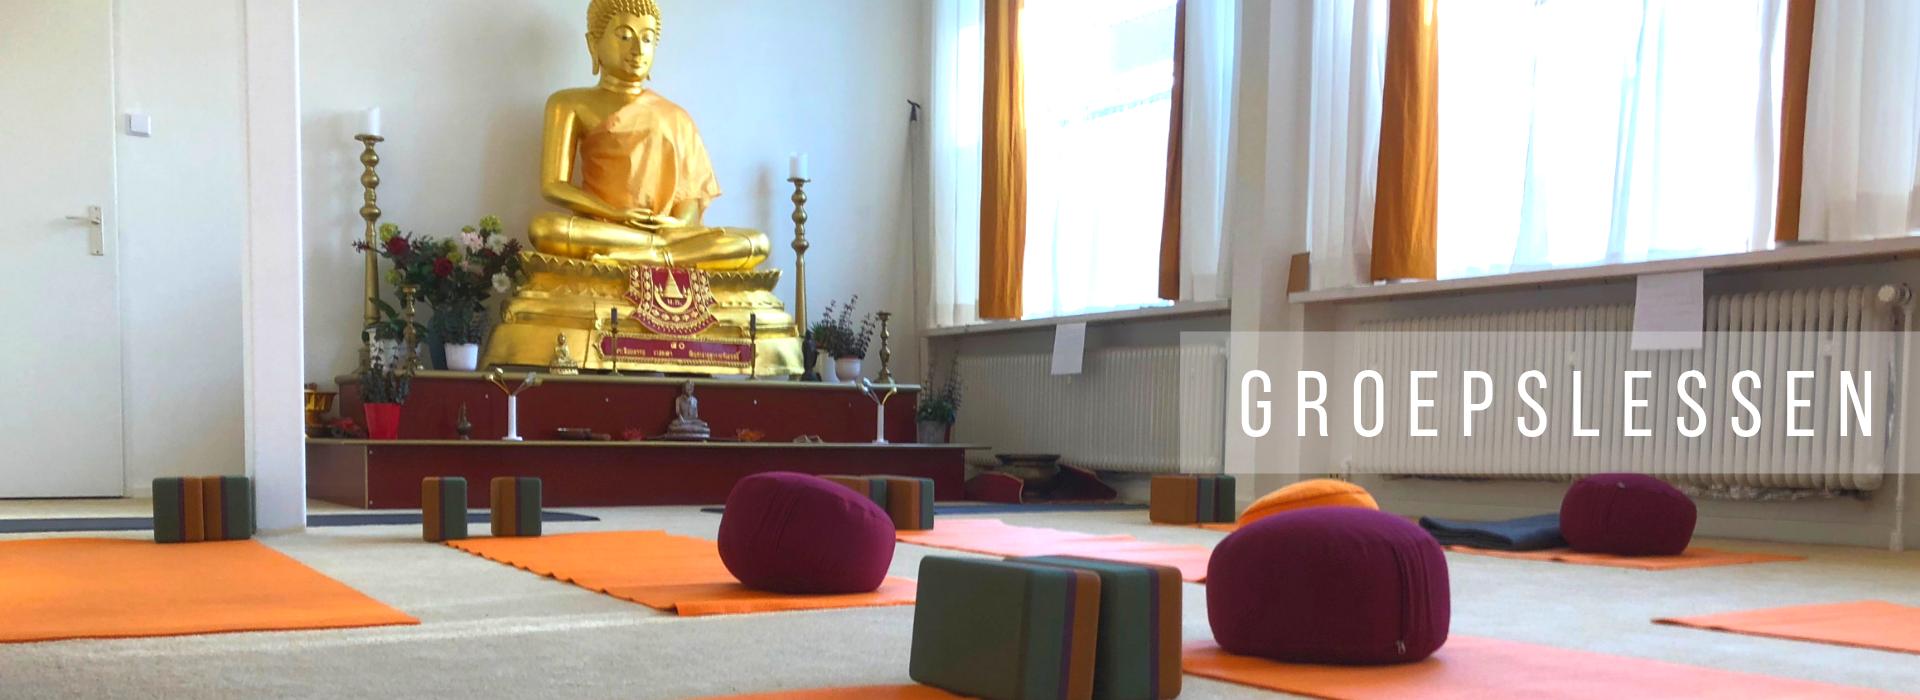 Groepslessen Healthy Yoga